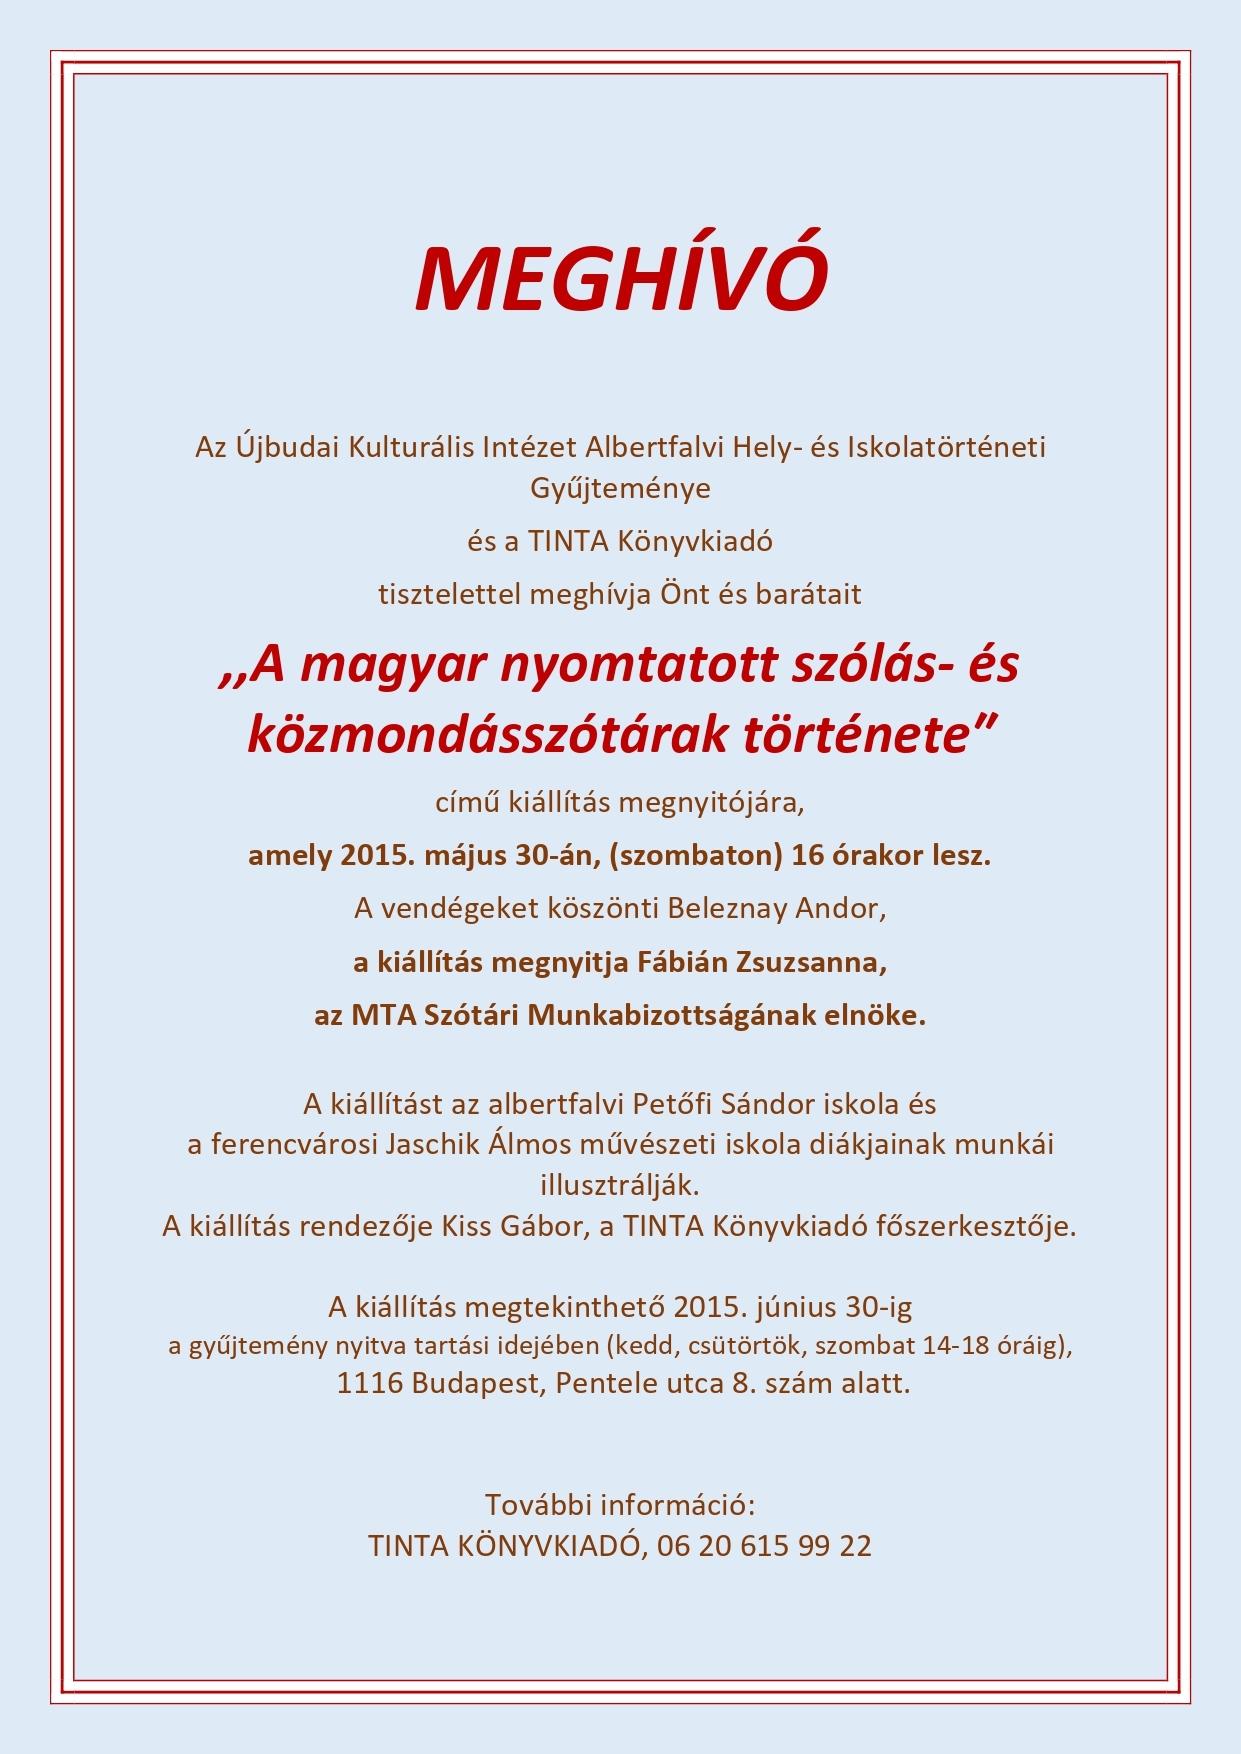 meghivo-albertfalva-2015.jpg